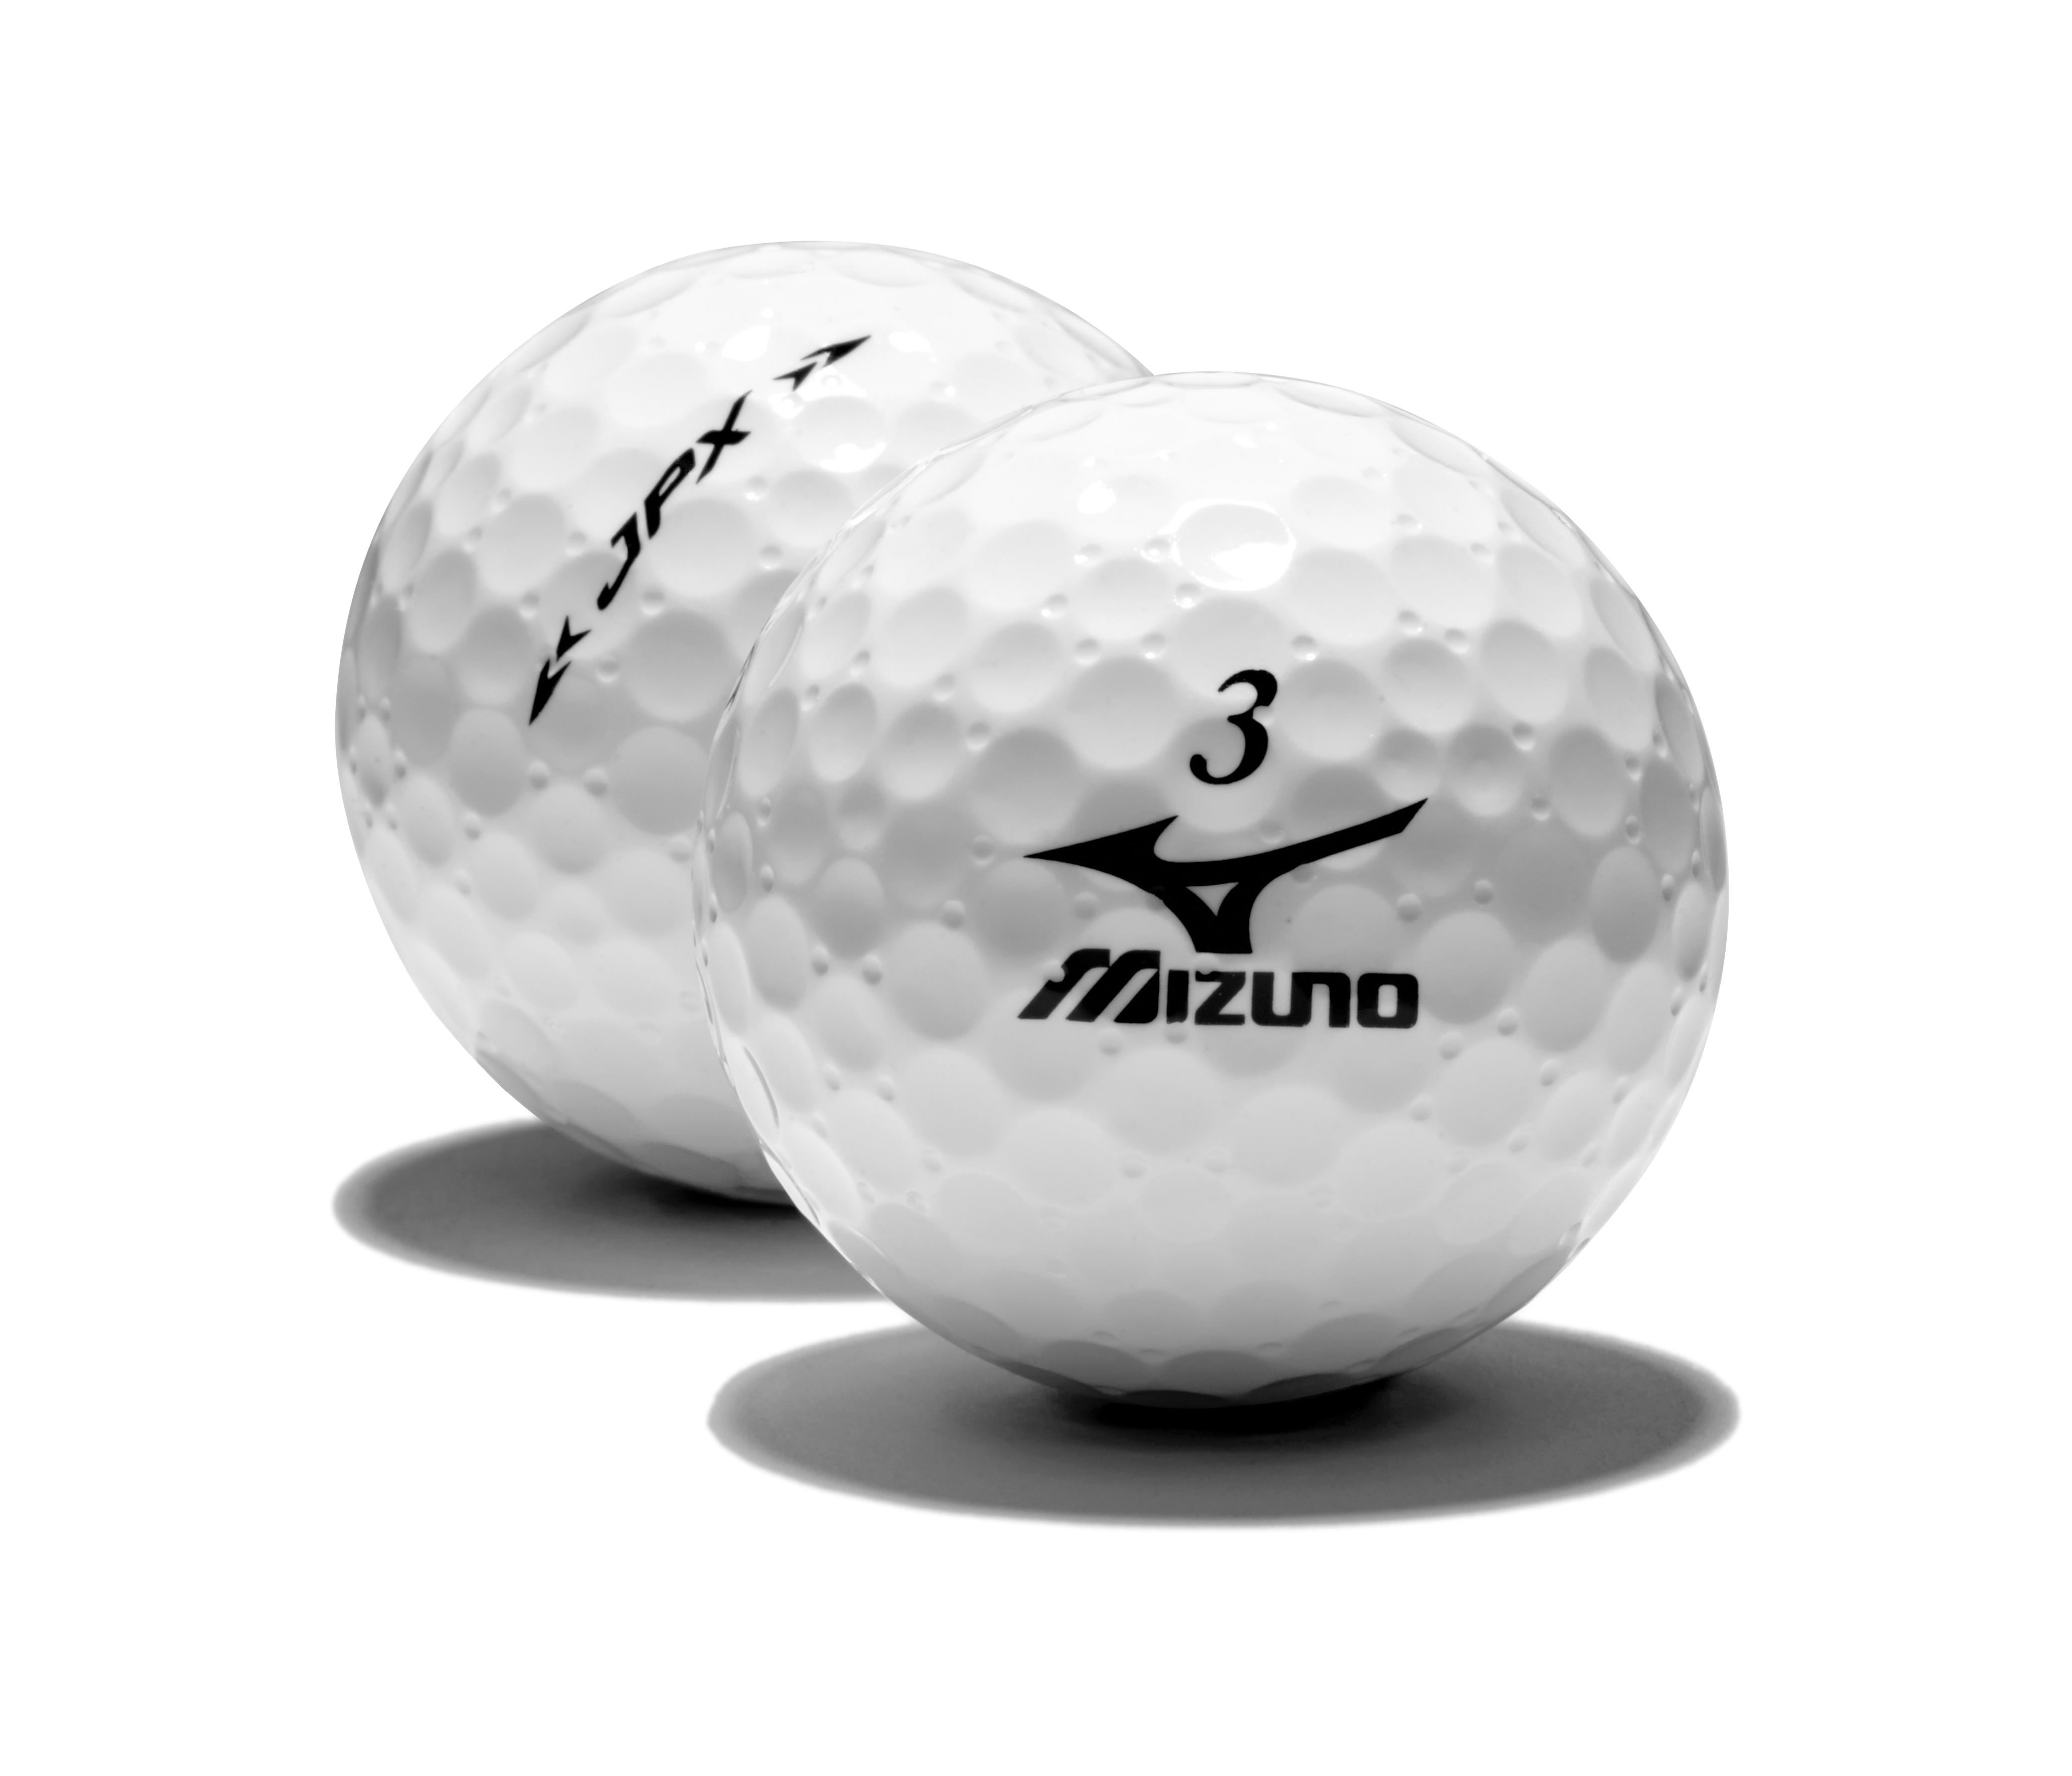 Golf Care announces new partnership with Mizuno